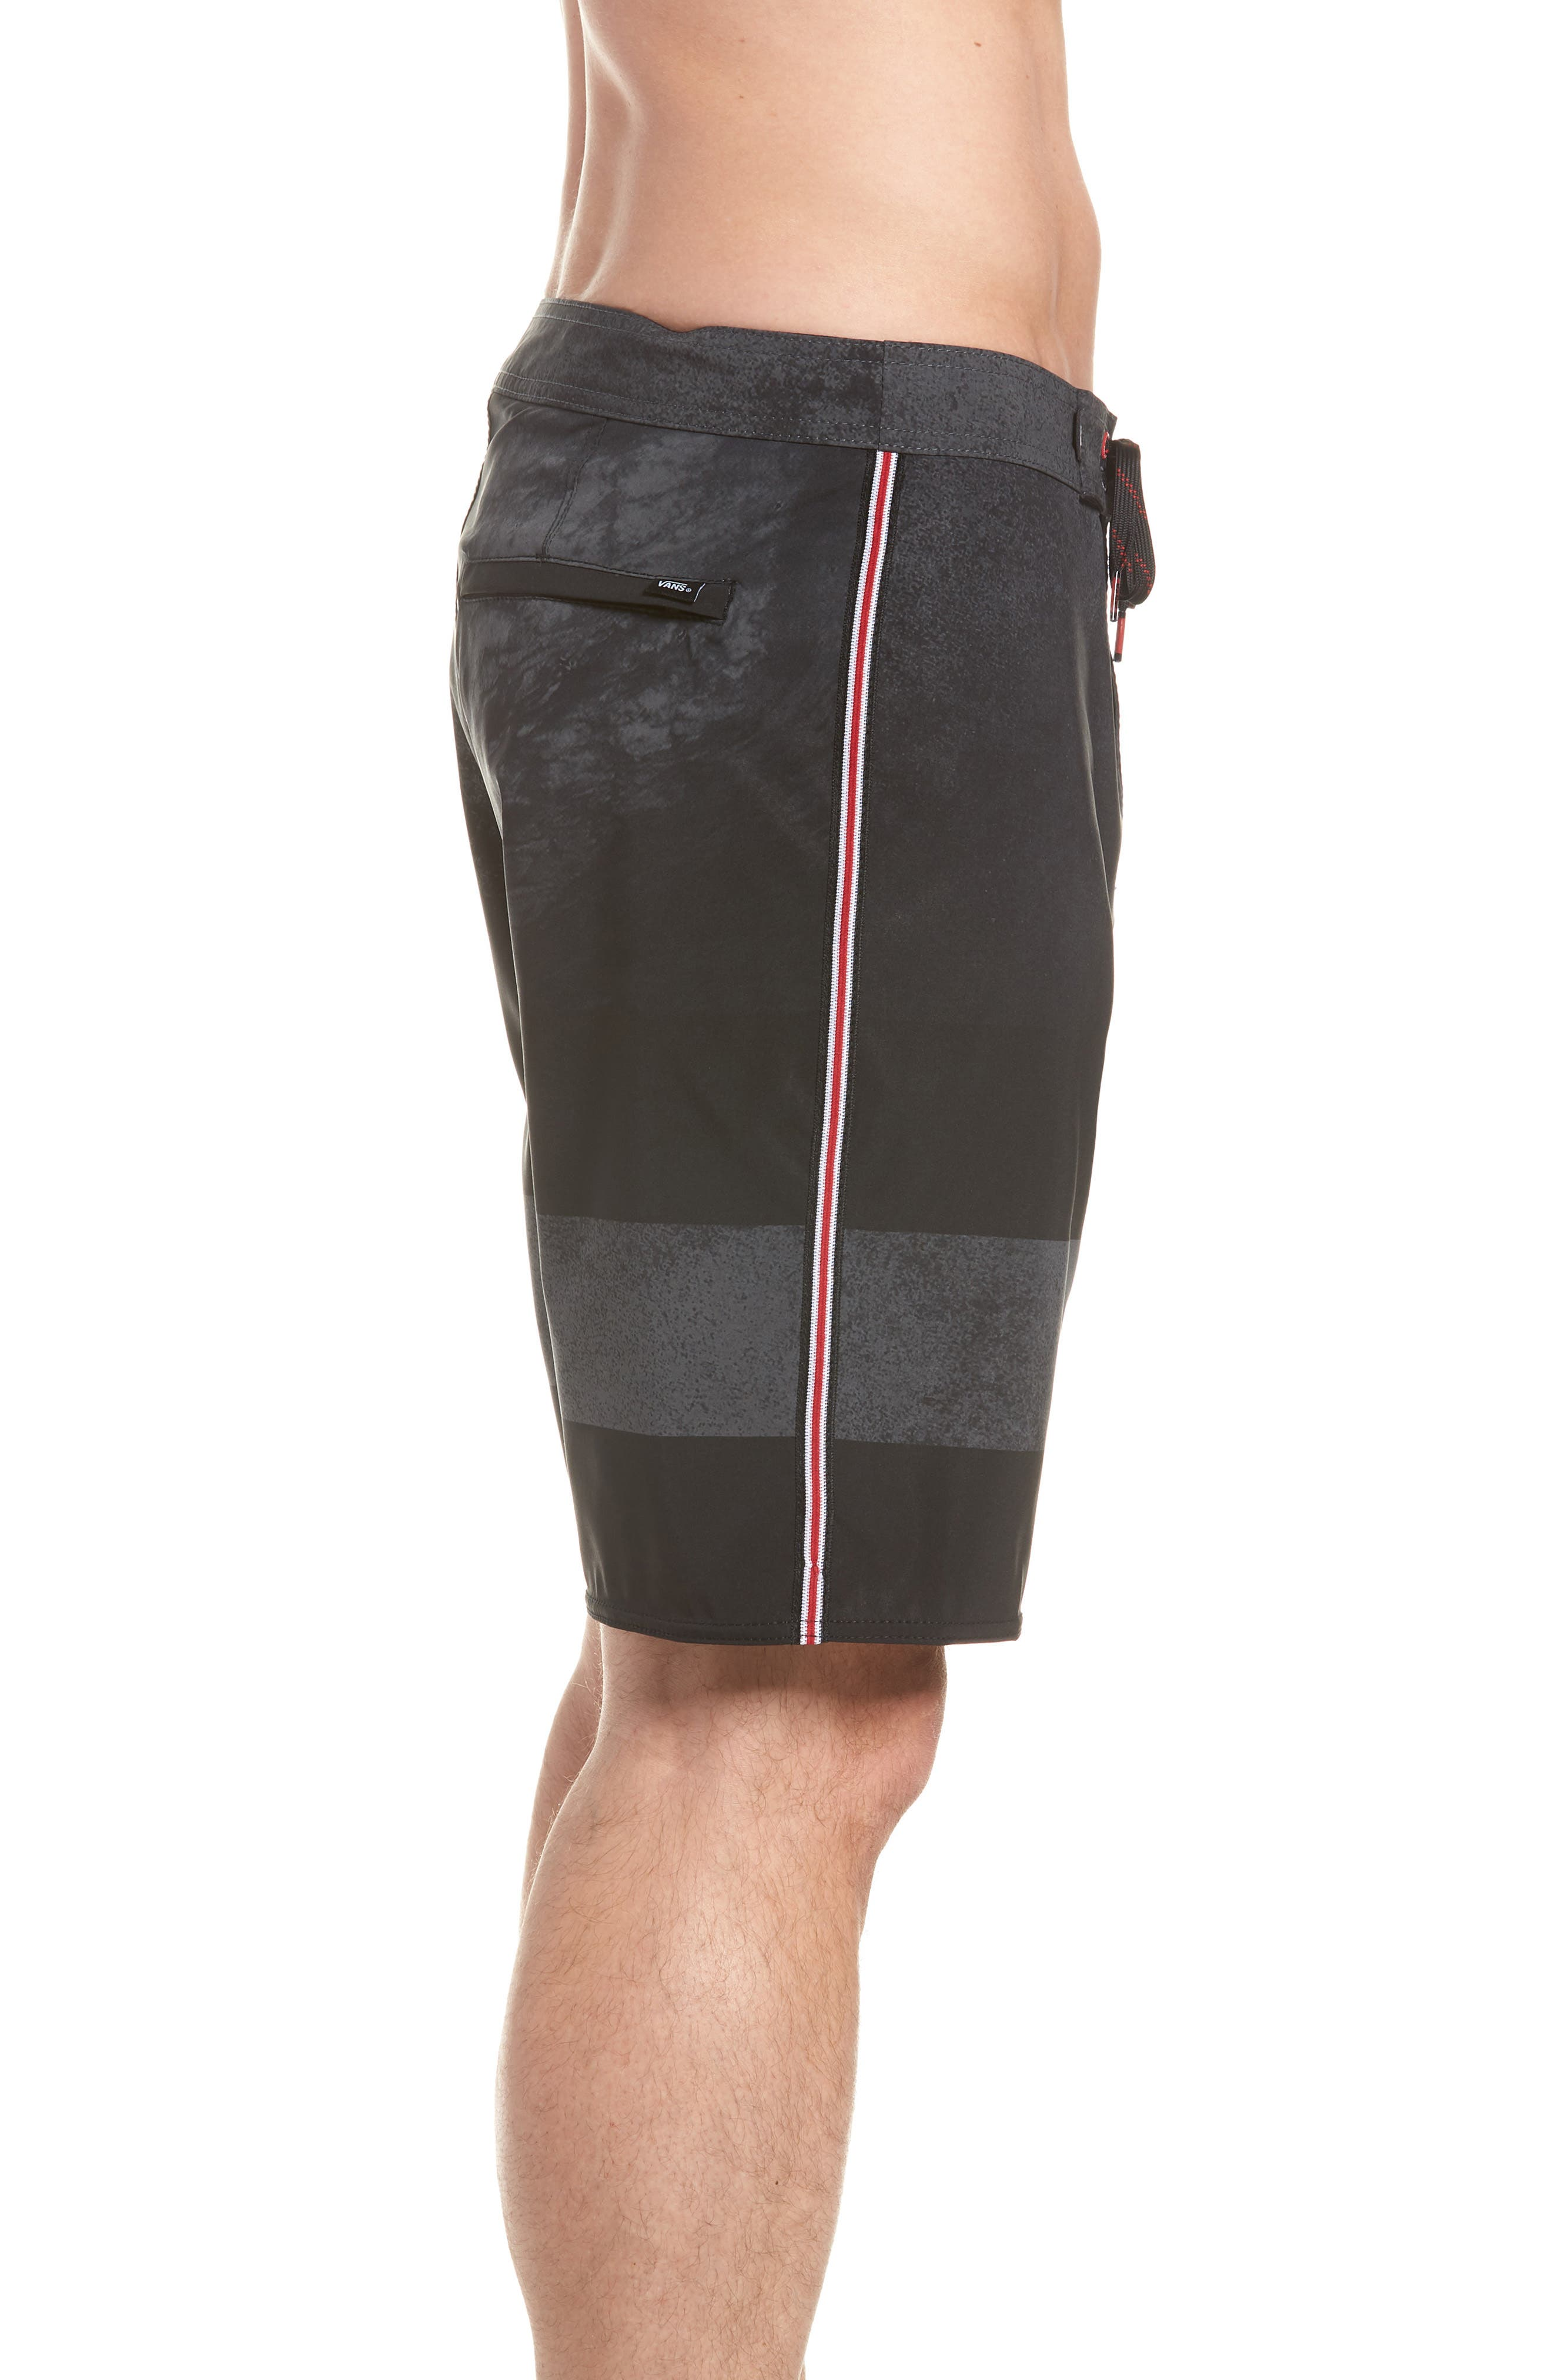 Era Board Shorts,                             Alternate thumbnail 3, color,                             BLACK/ NATHAN FLORENCE